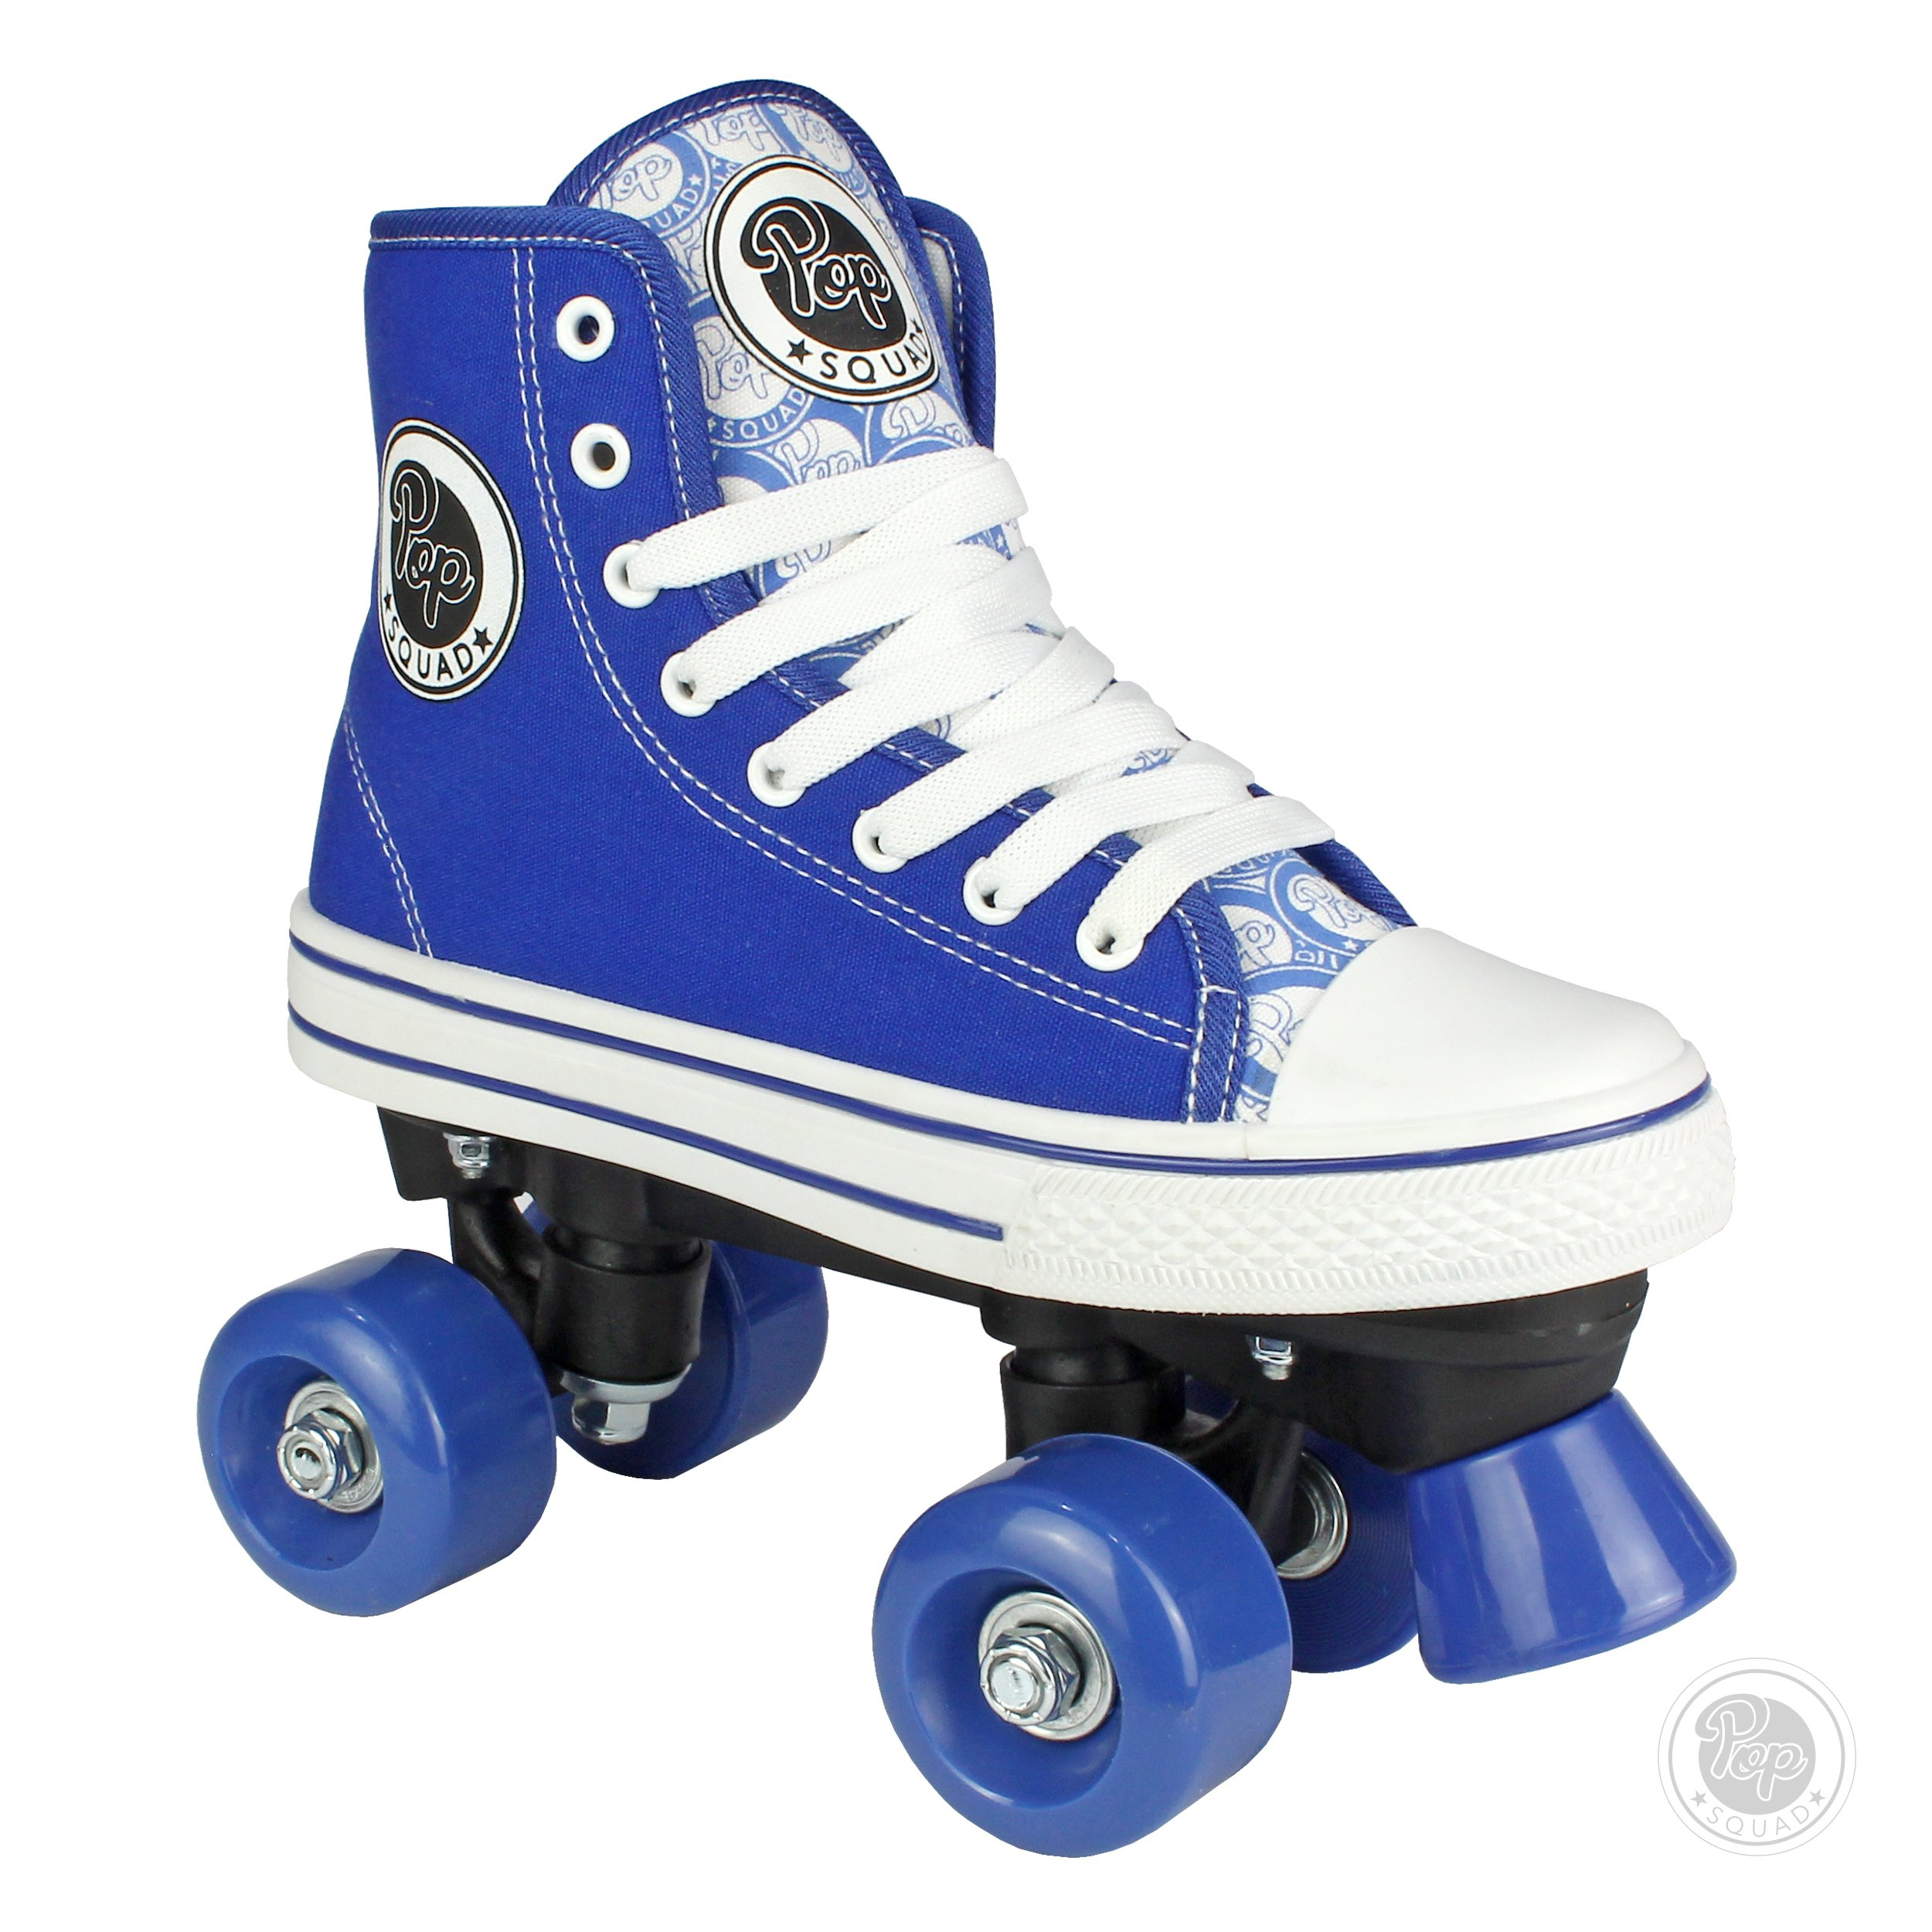 Pop Squad Midtown Girl's and Boy's Roller Skates - Blue (4)